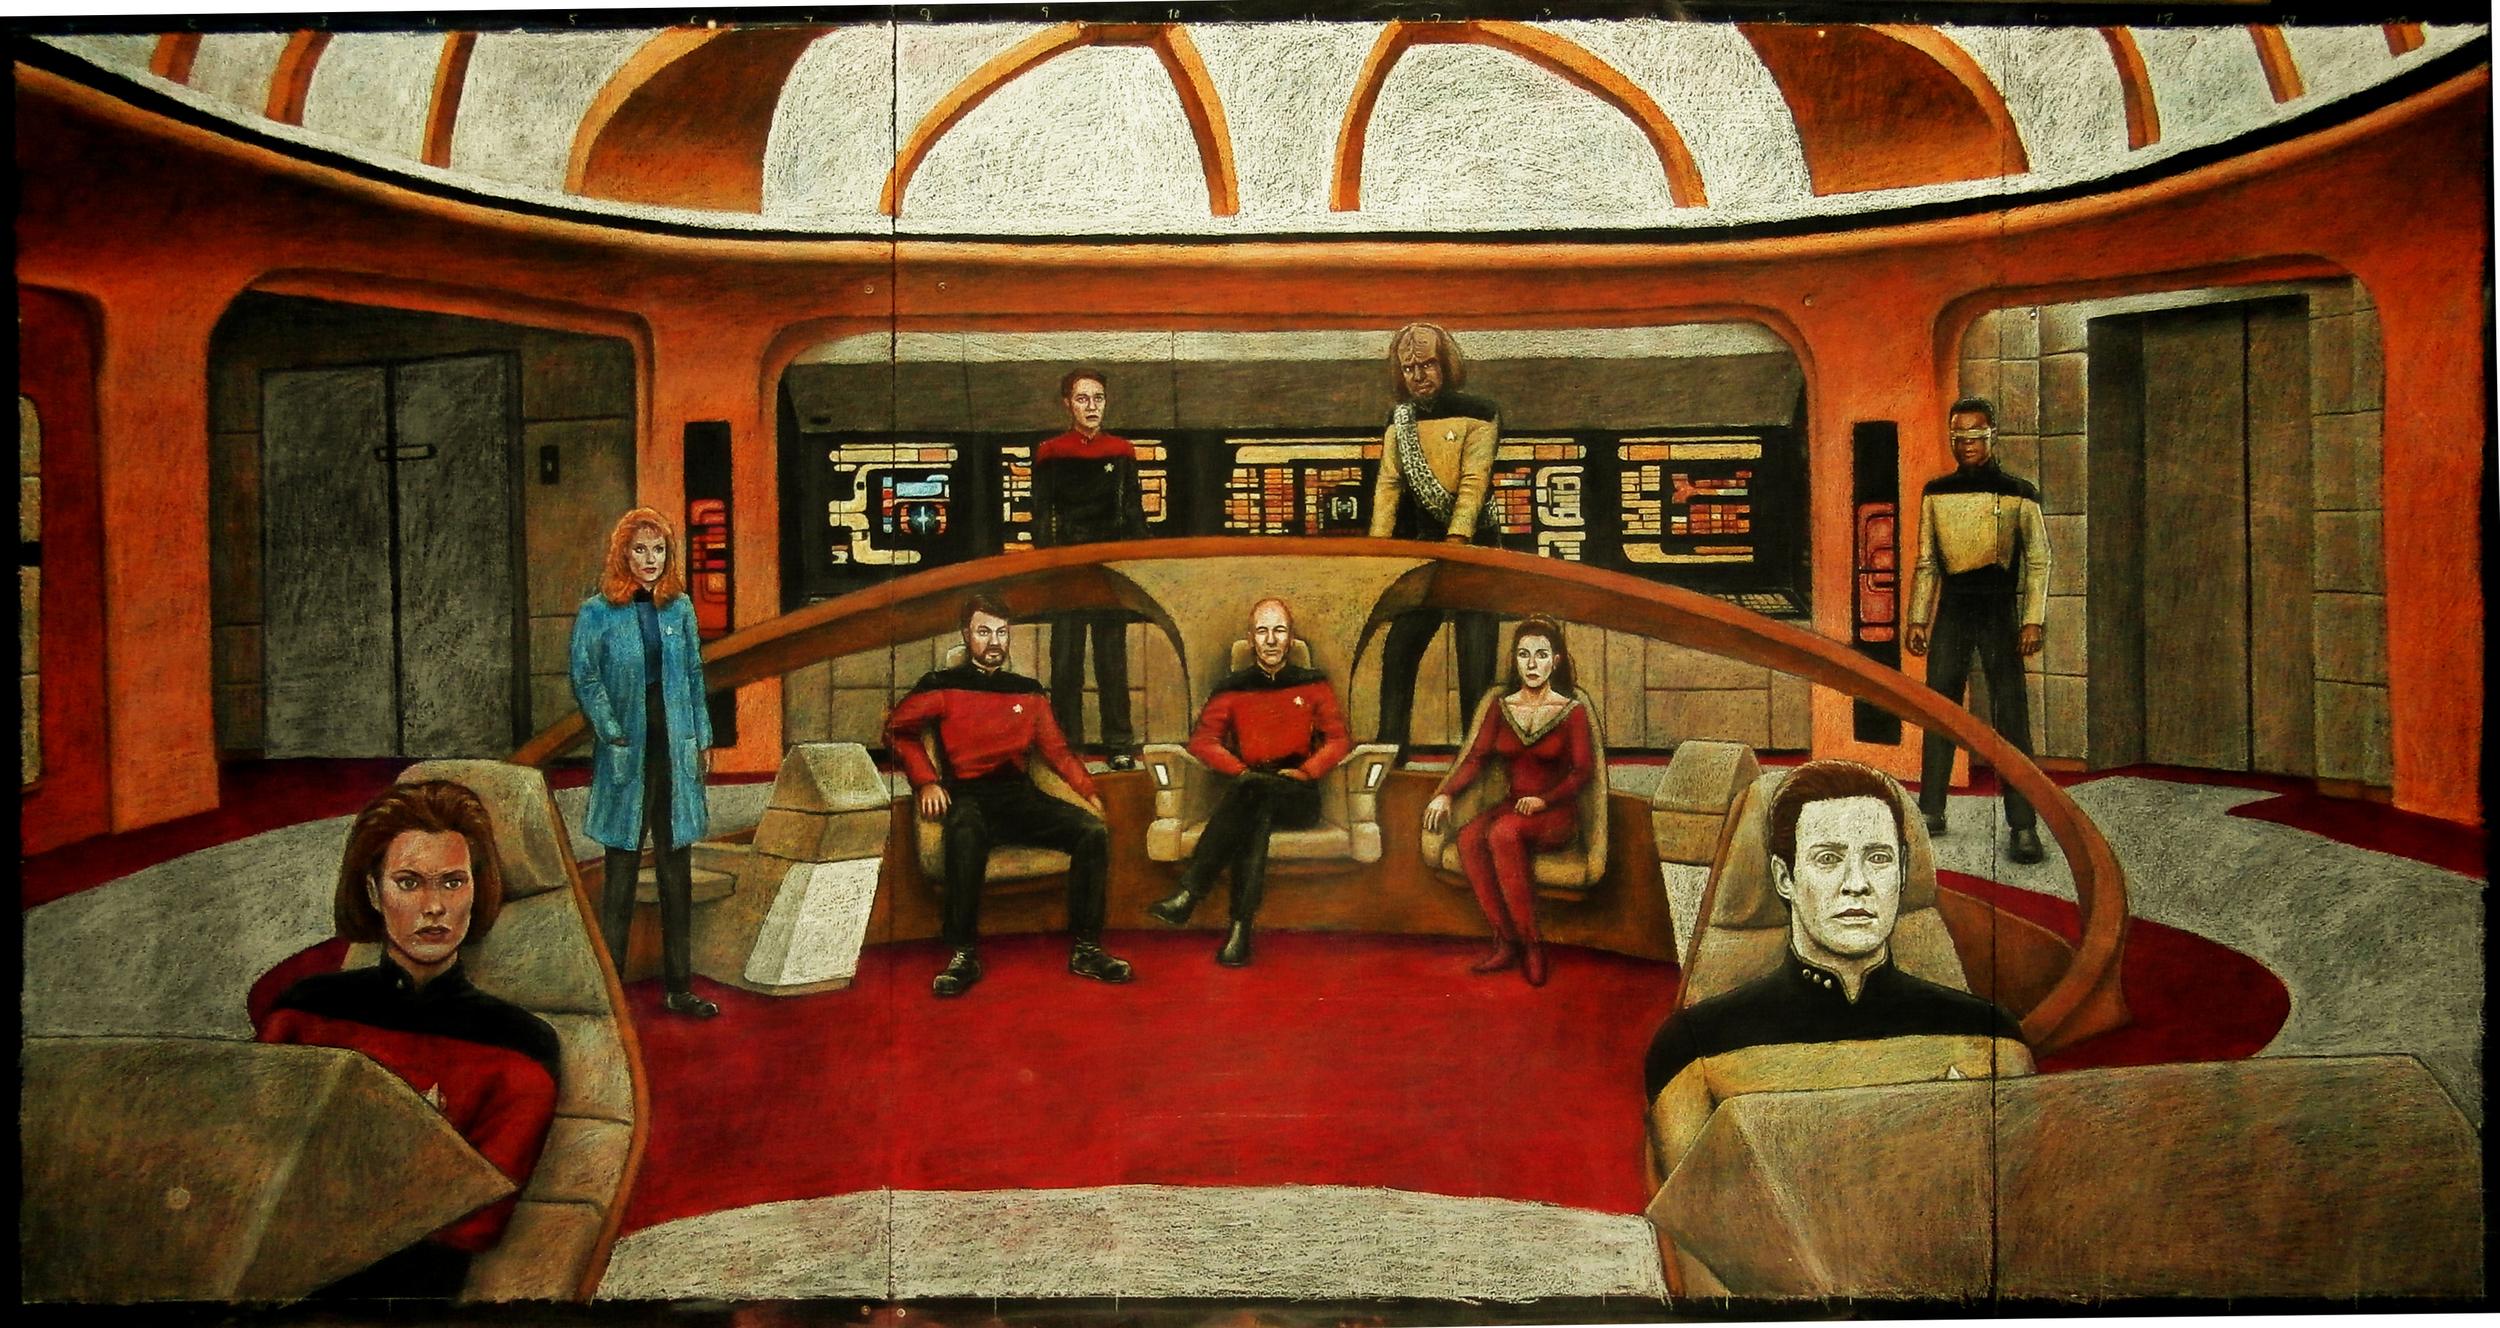 Star Trek: The Next Generation chalk mural